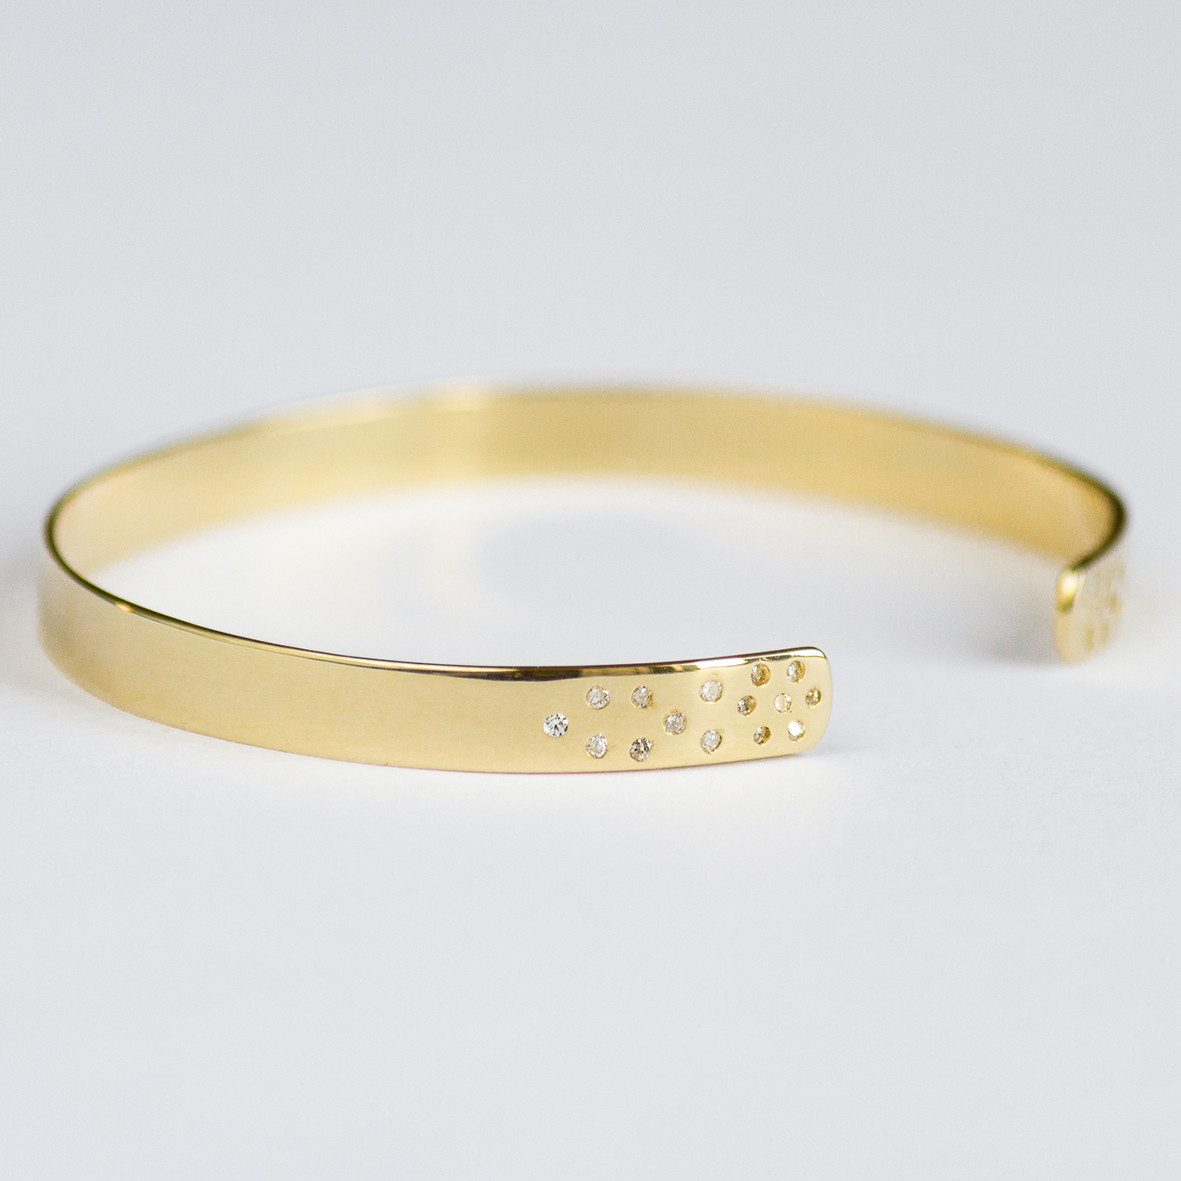 4. OONA_lotus_principal_diamond dotted bracelet